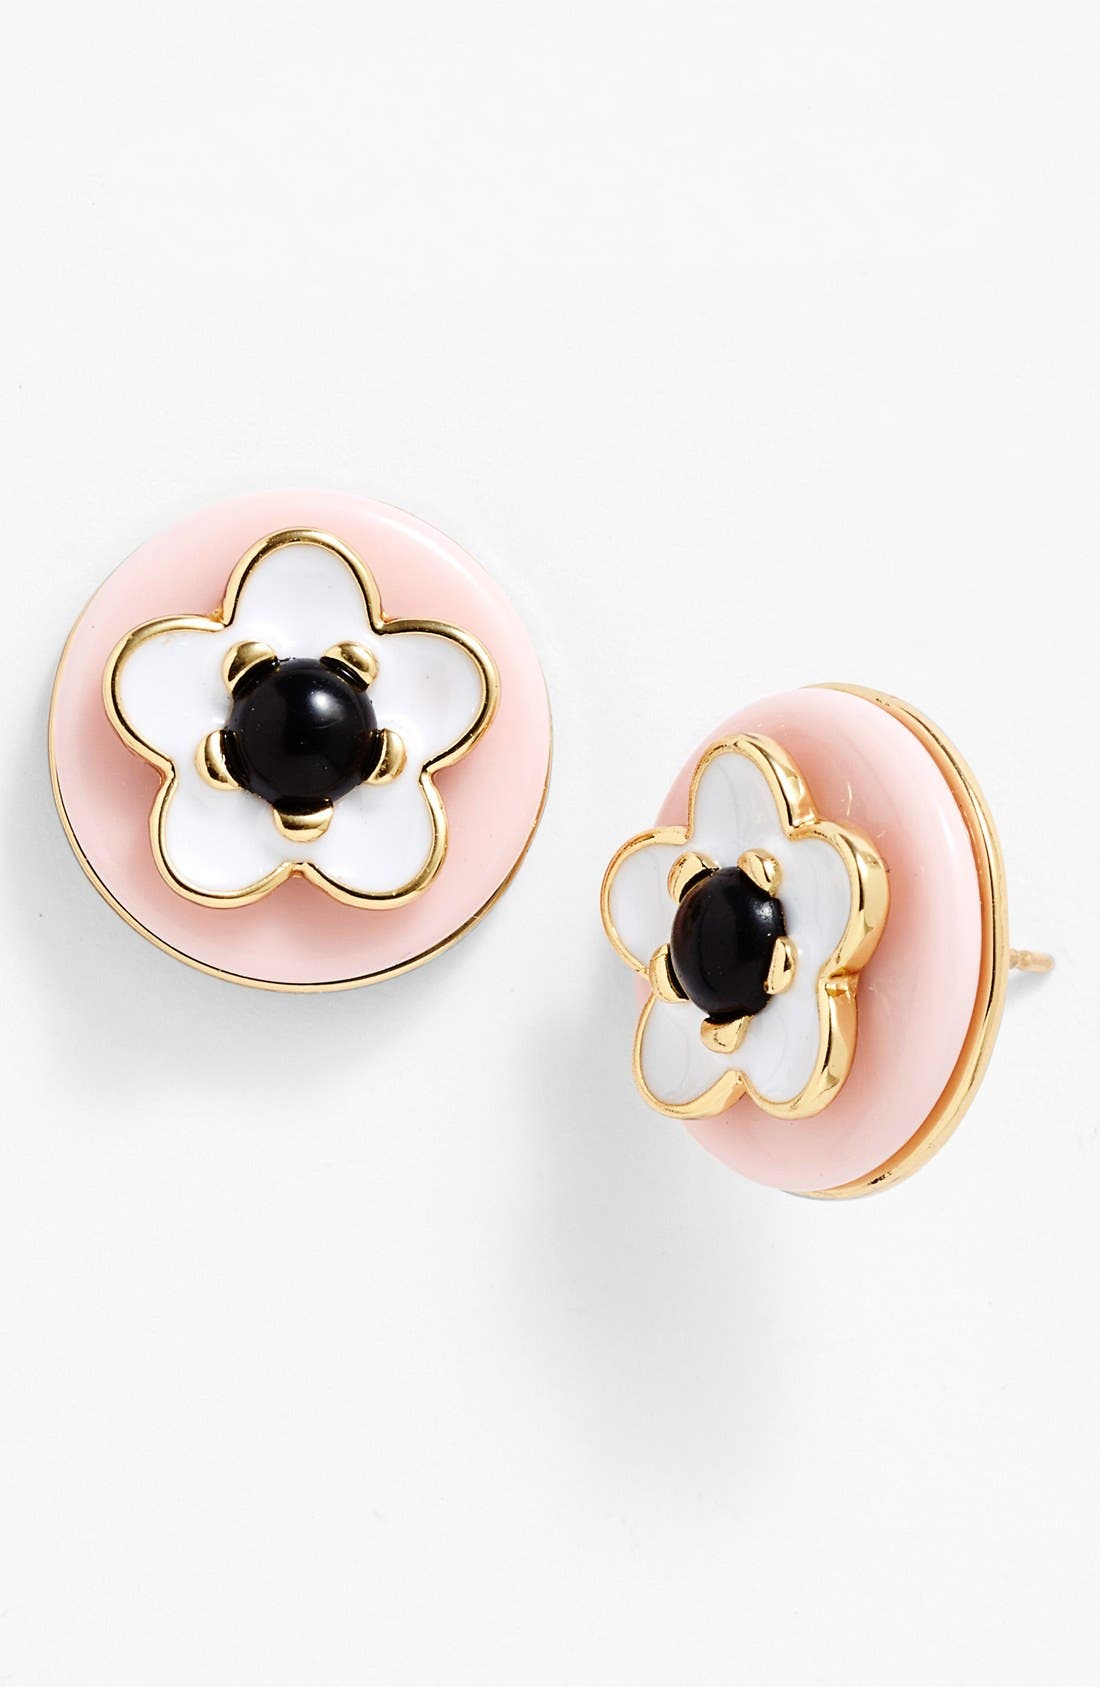 Main Image - kate spade new york 'mod flora' stud earrings